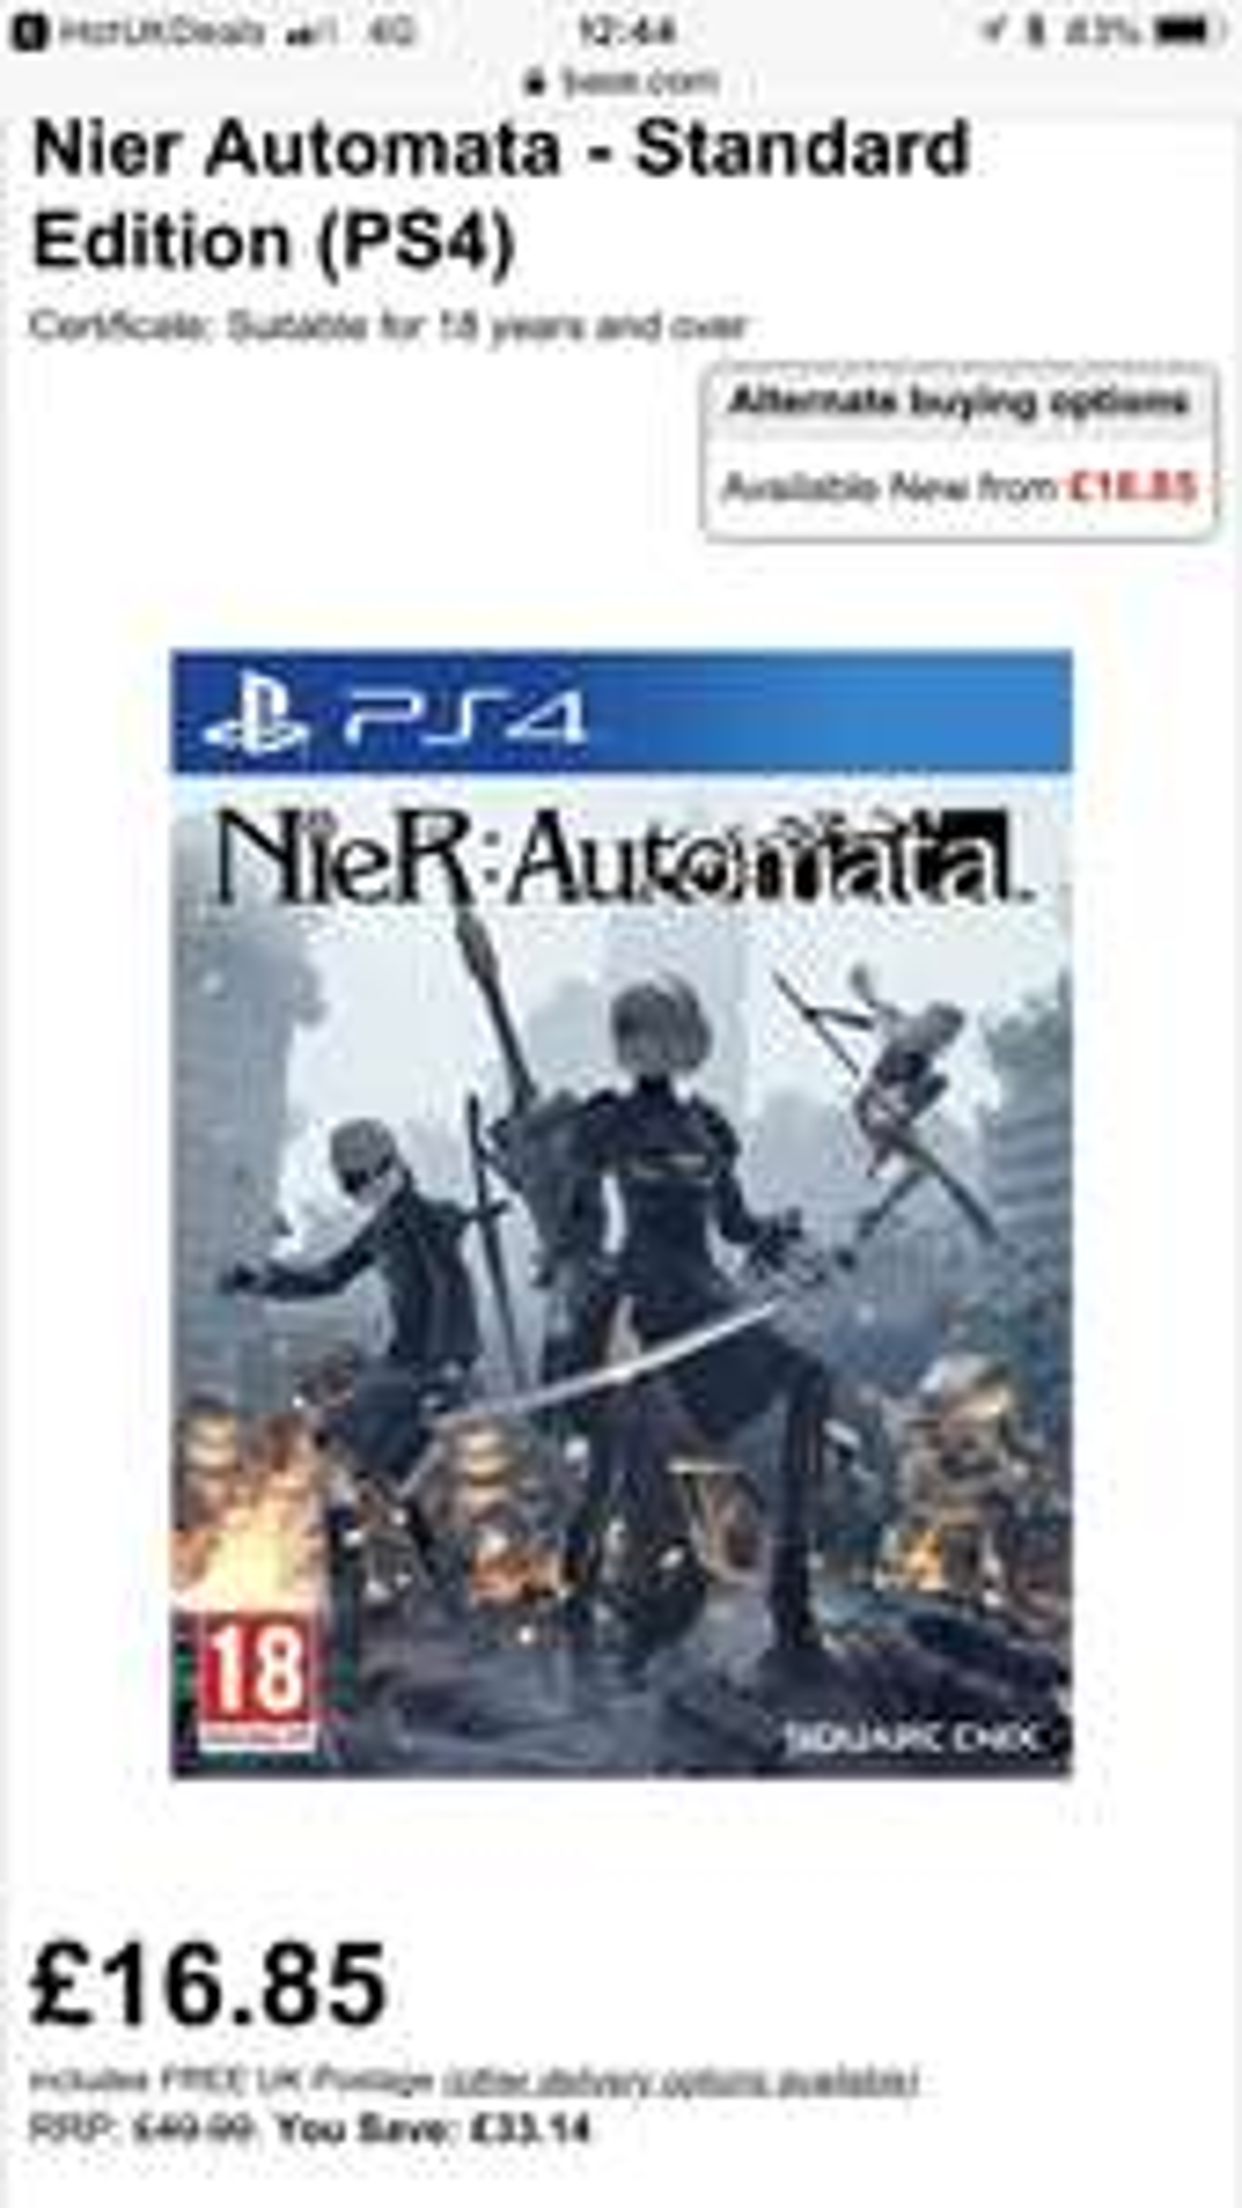 Nier Automata - Standard Edition (PS4) - £16.85 @ BASE